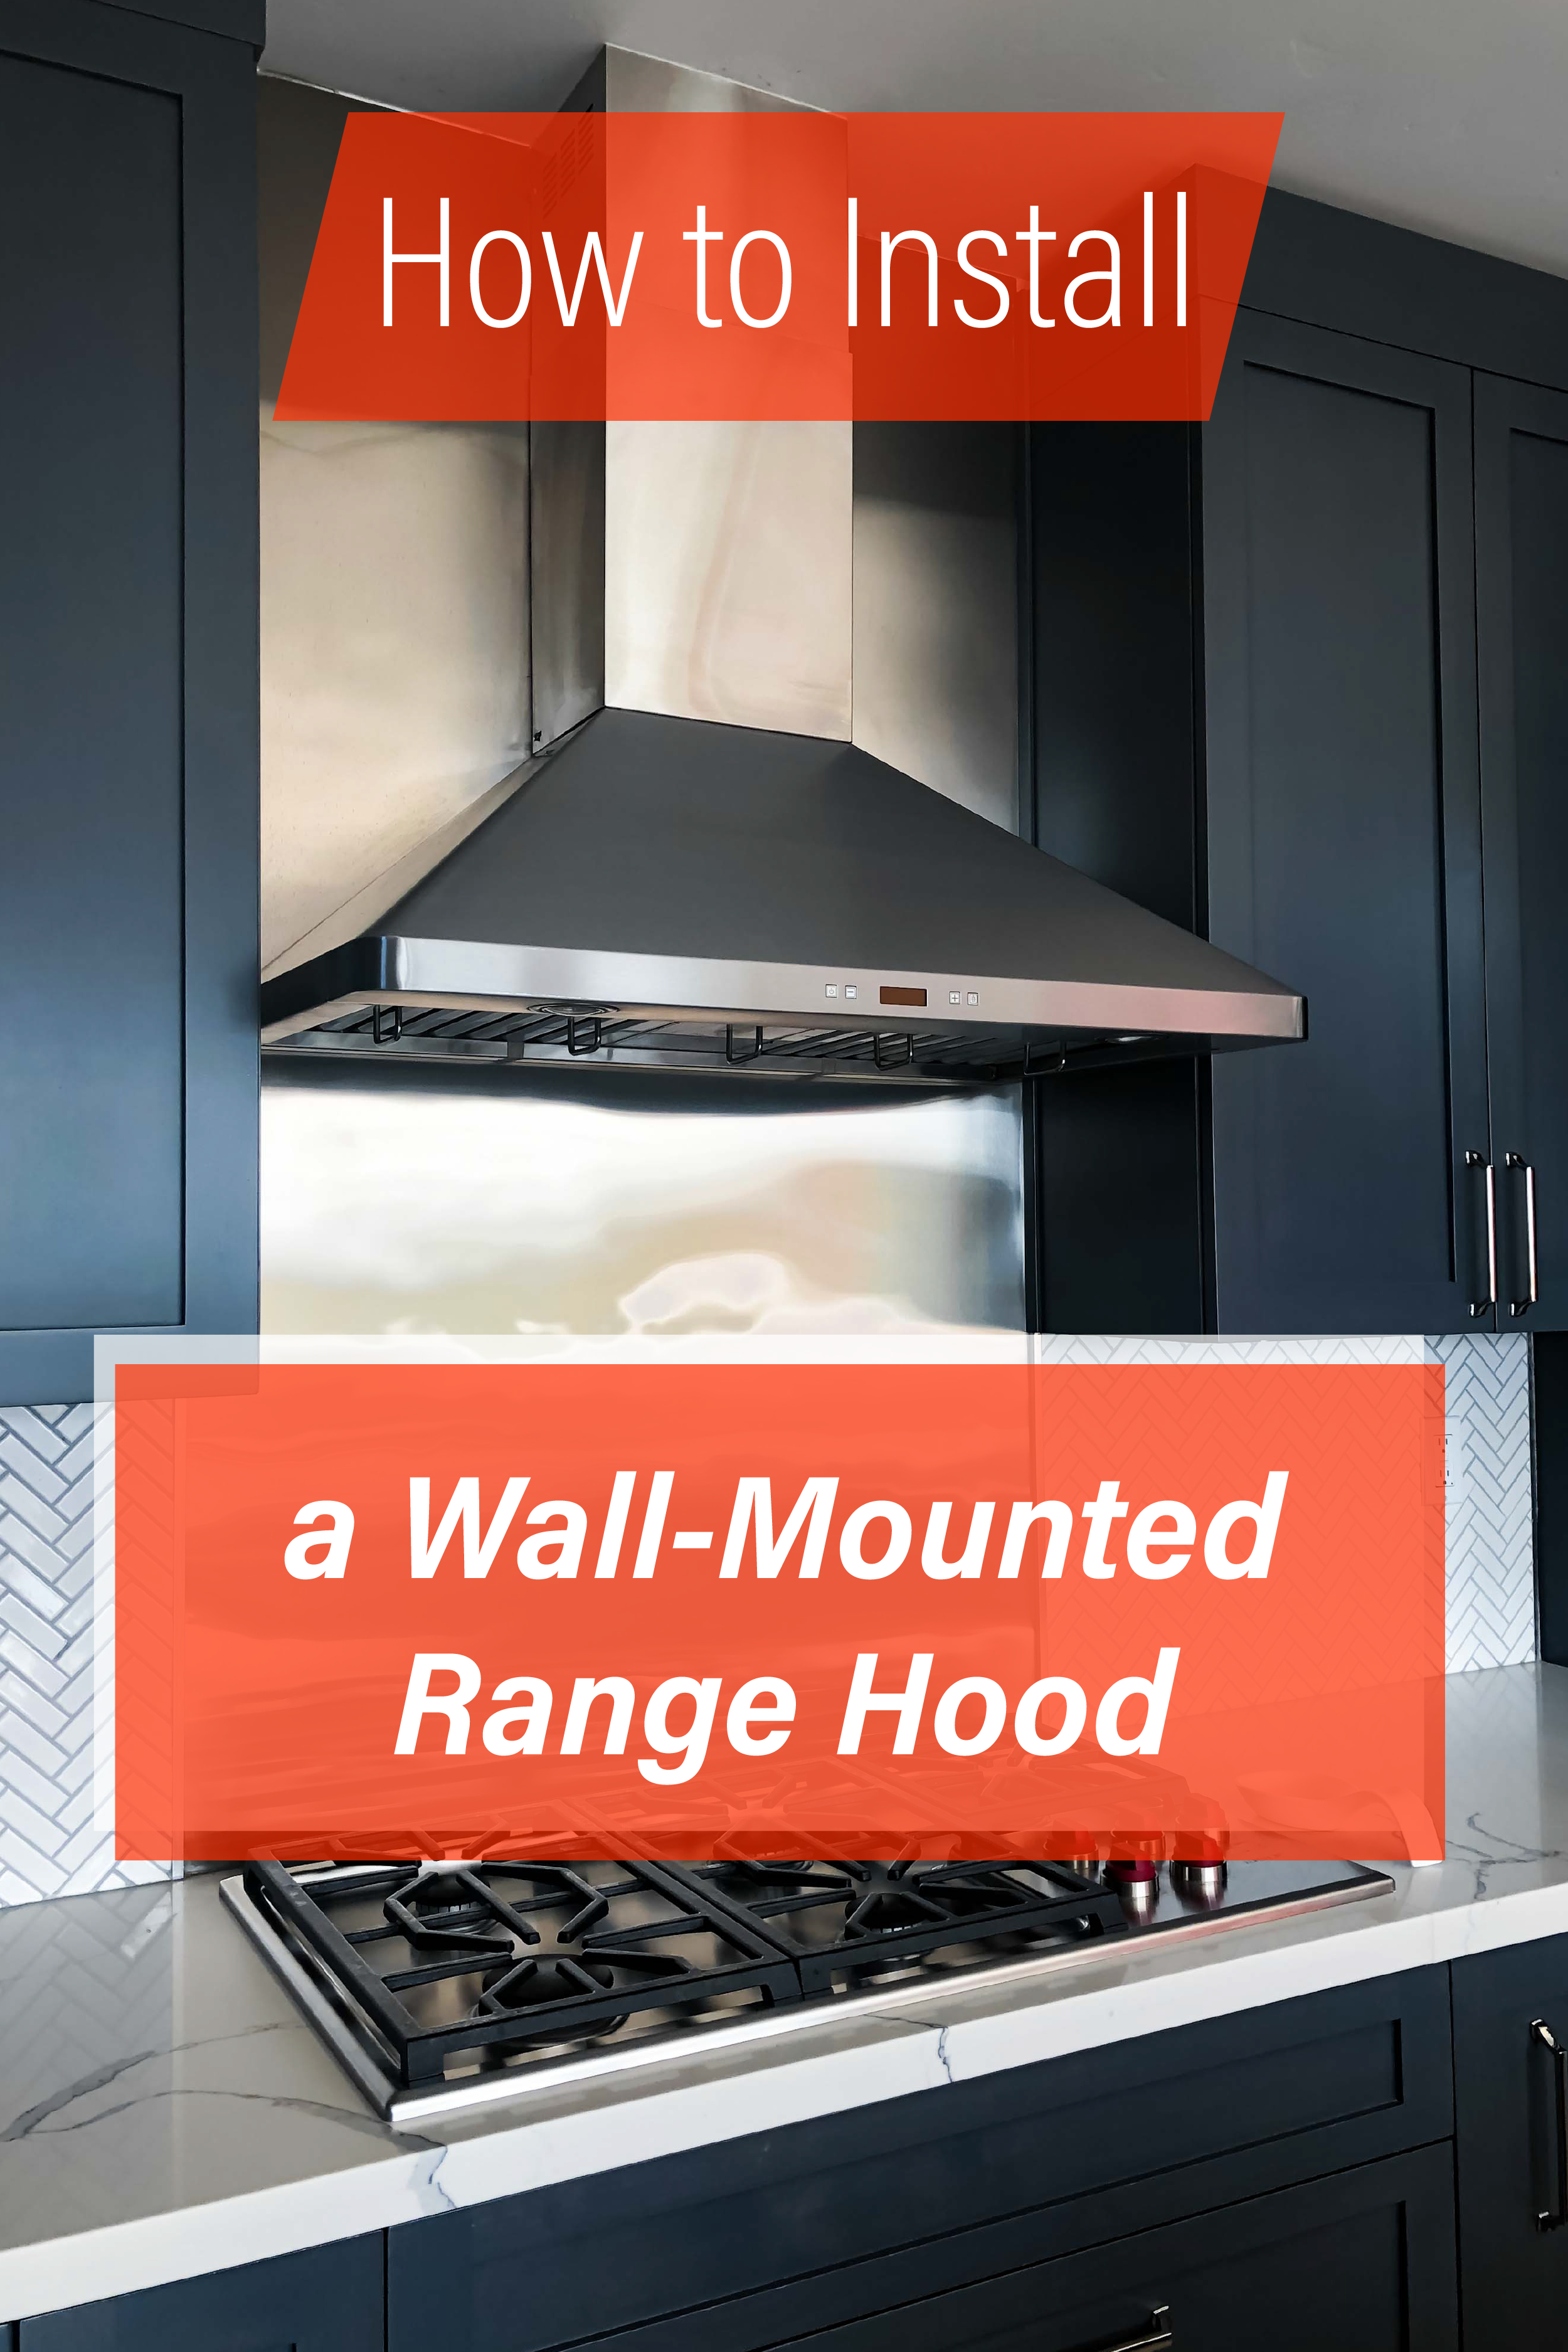 How To Install A Proline Wall Mount Range Hood Pljw 129 Wall Mount Range Hood Range Hood Wall Vents